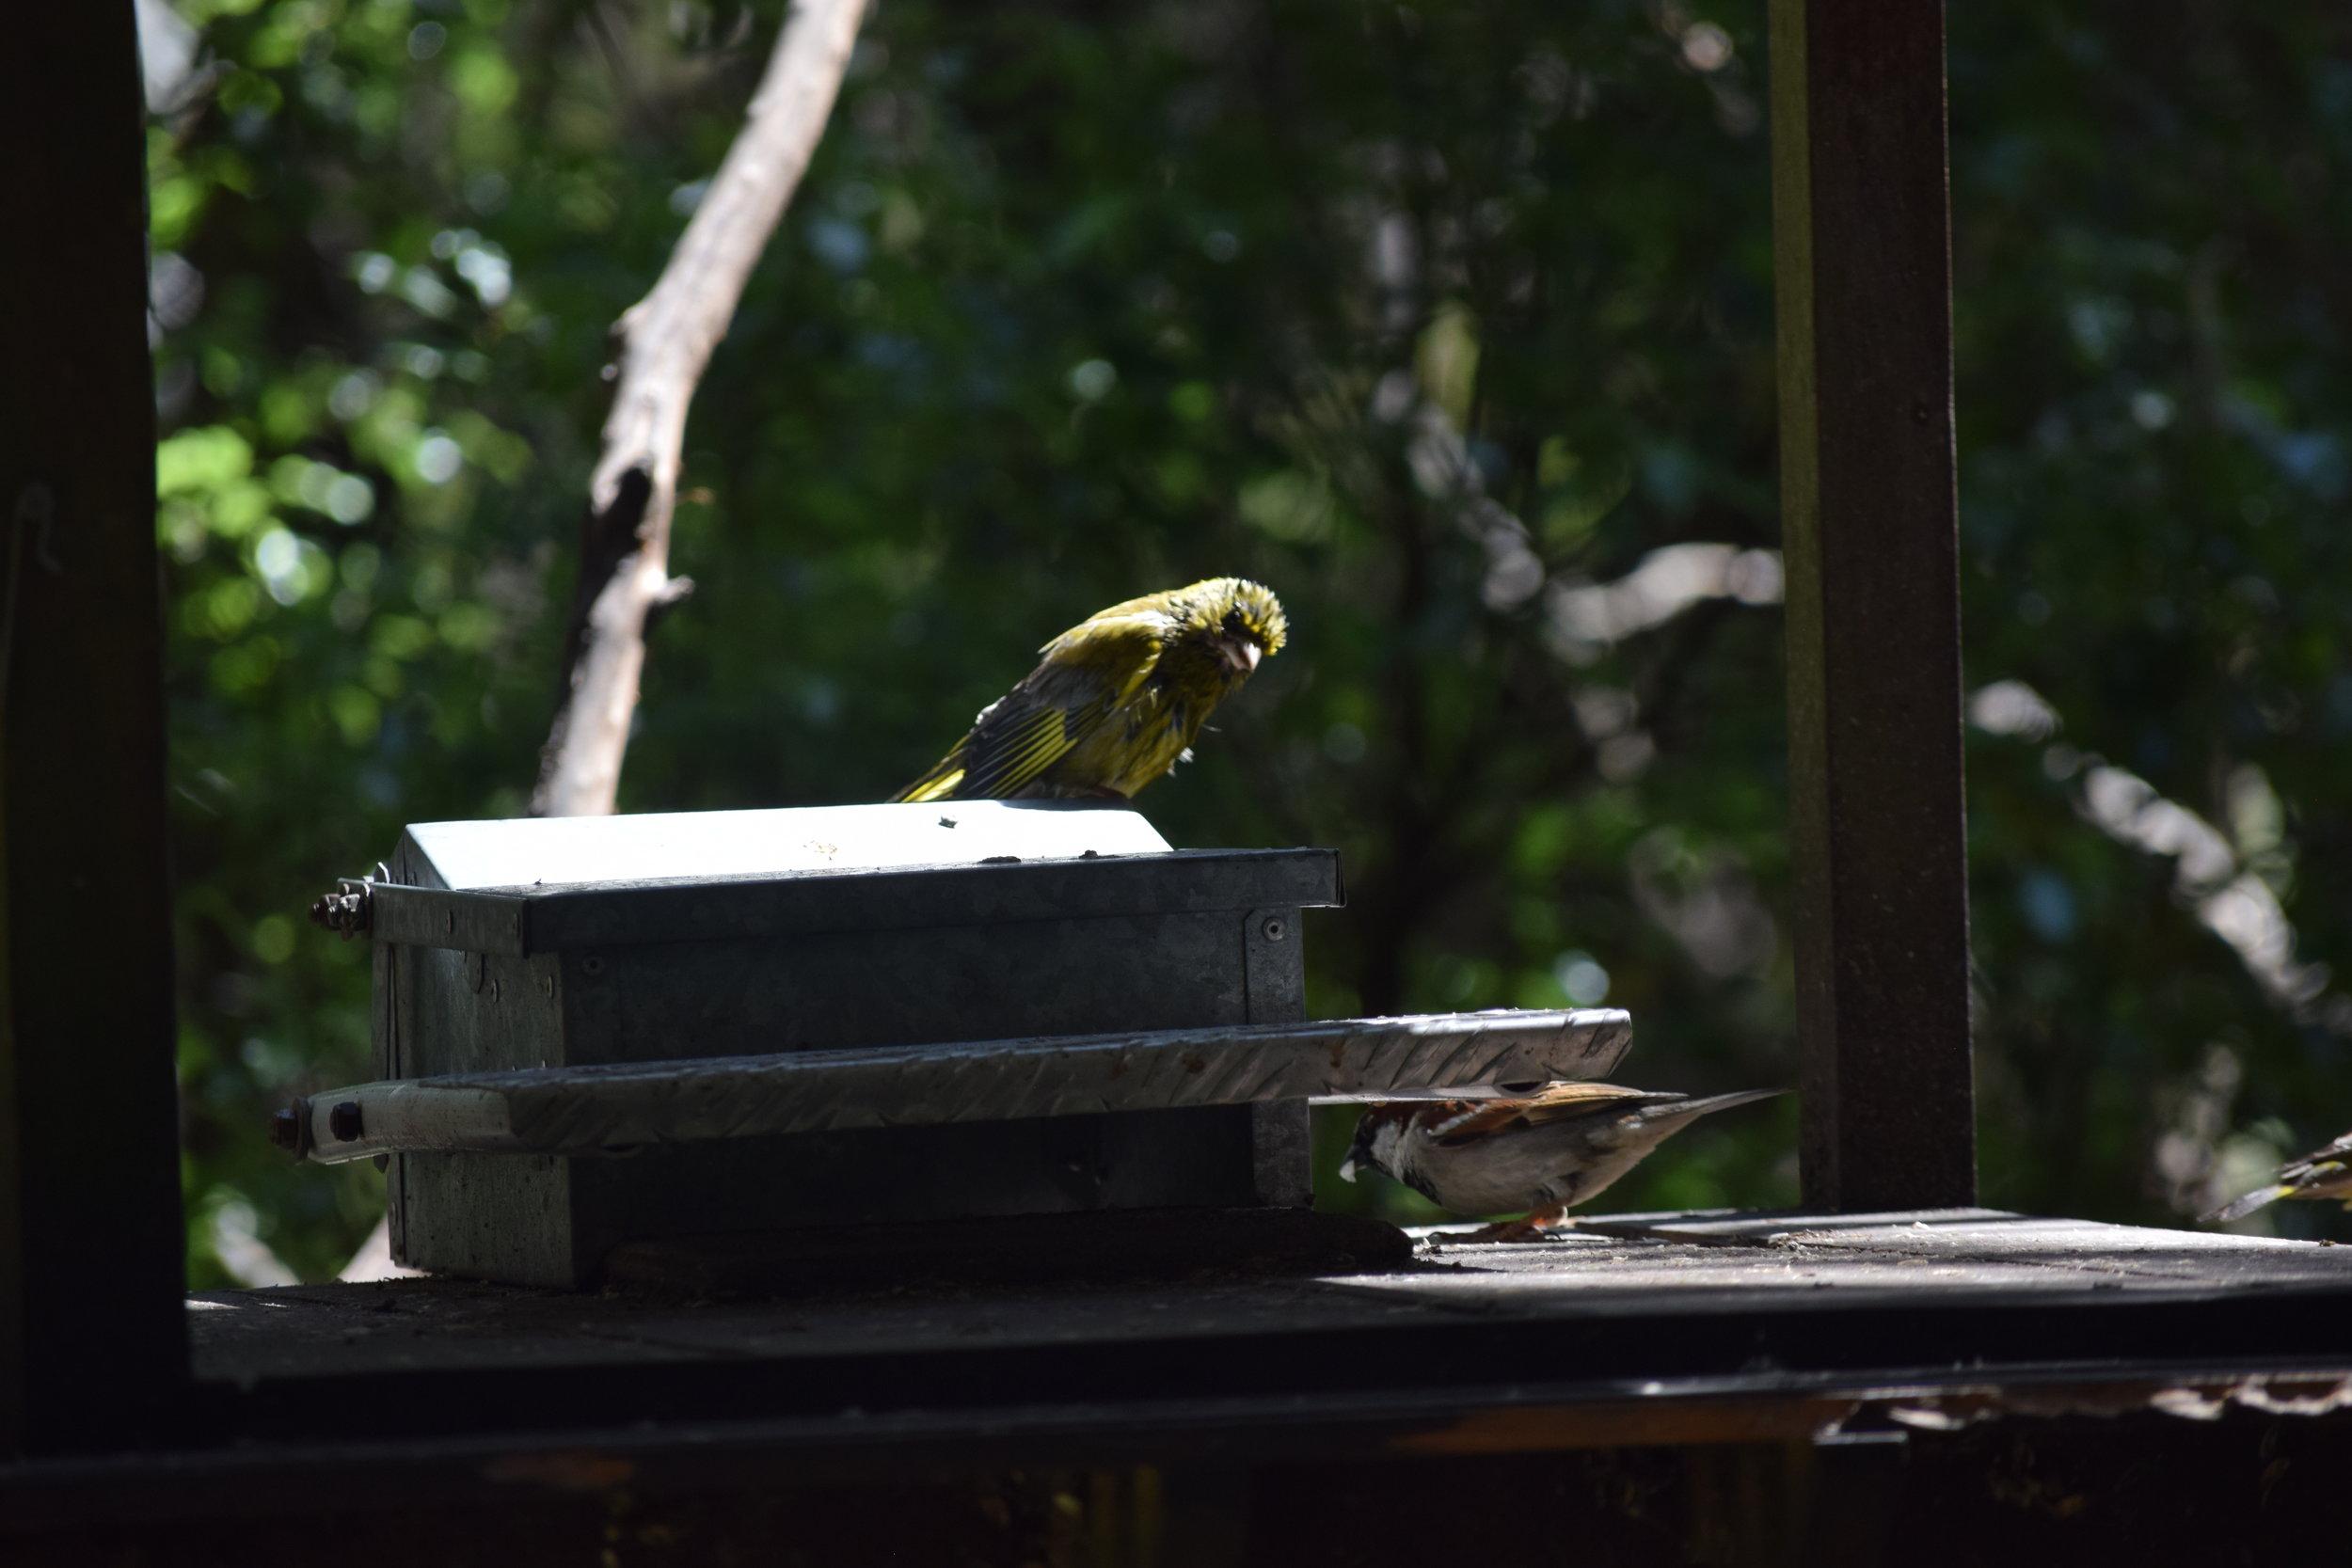 Hey! How do  we  get into the feeder box?